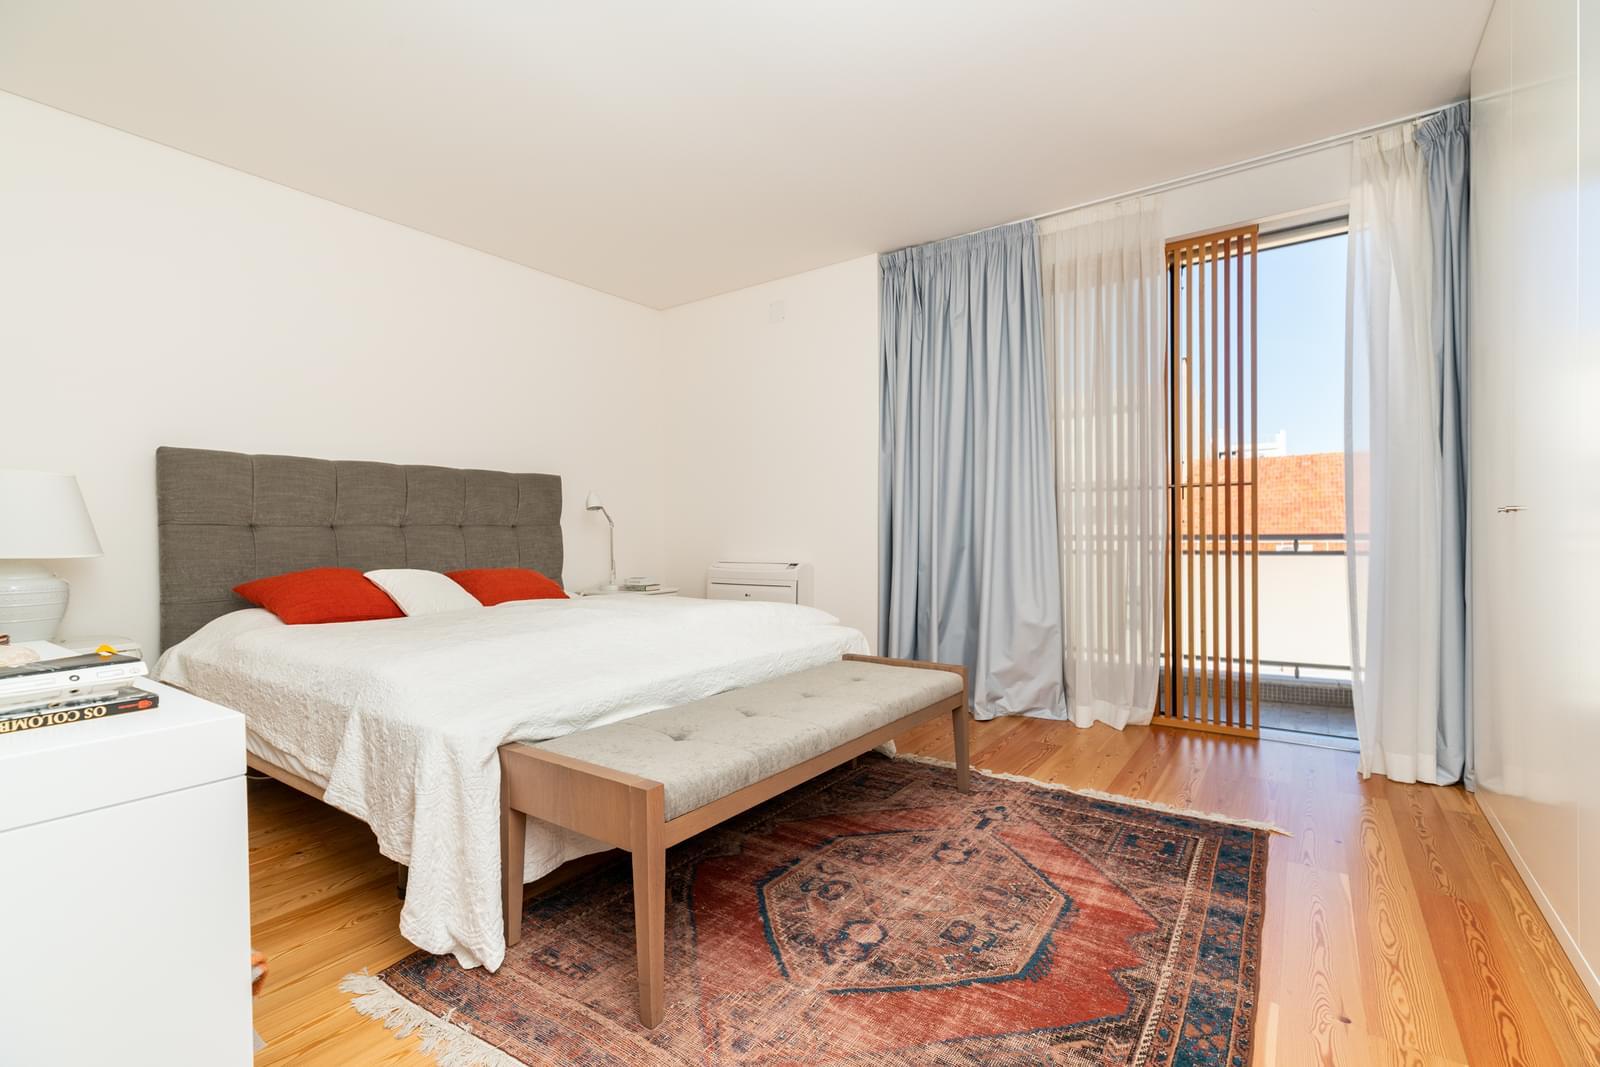 pf19126-apartamento-t2-lisboa-8e301394-9e42-449a-8b29-a92433662686